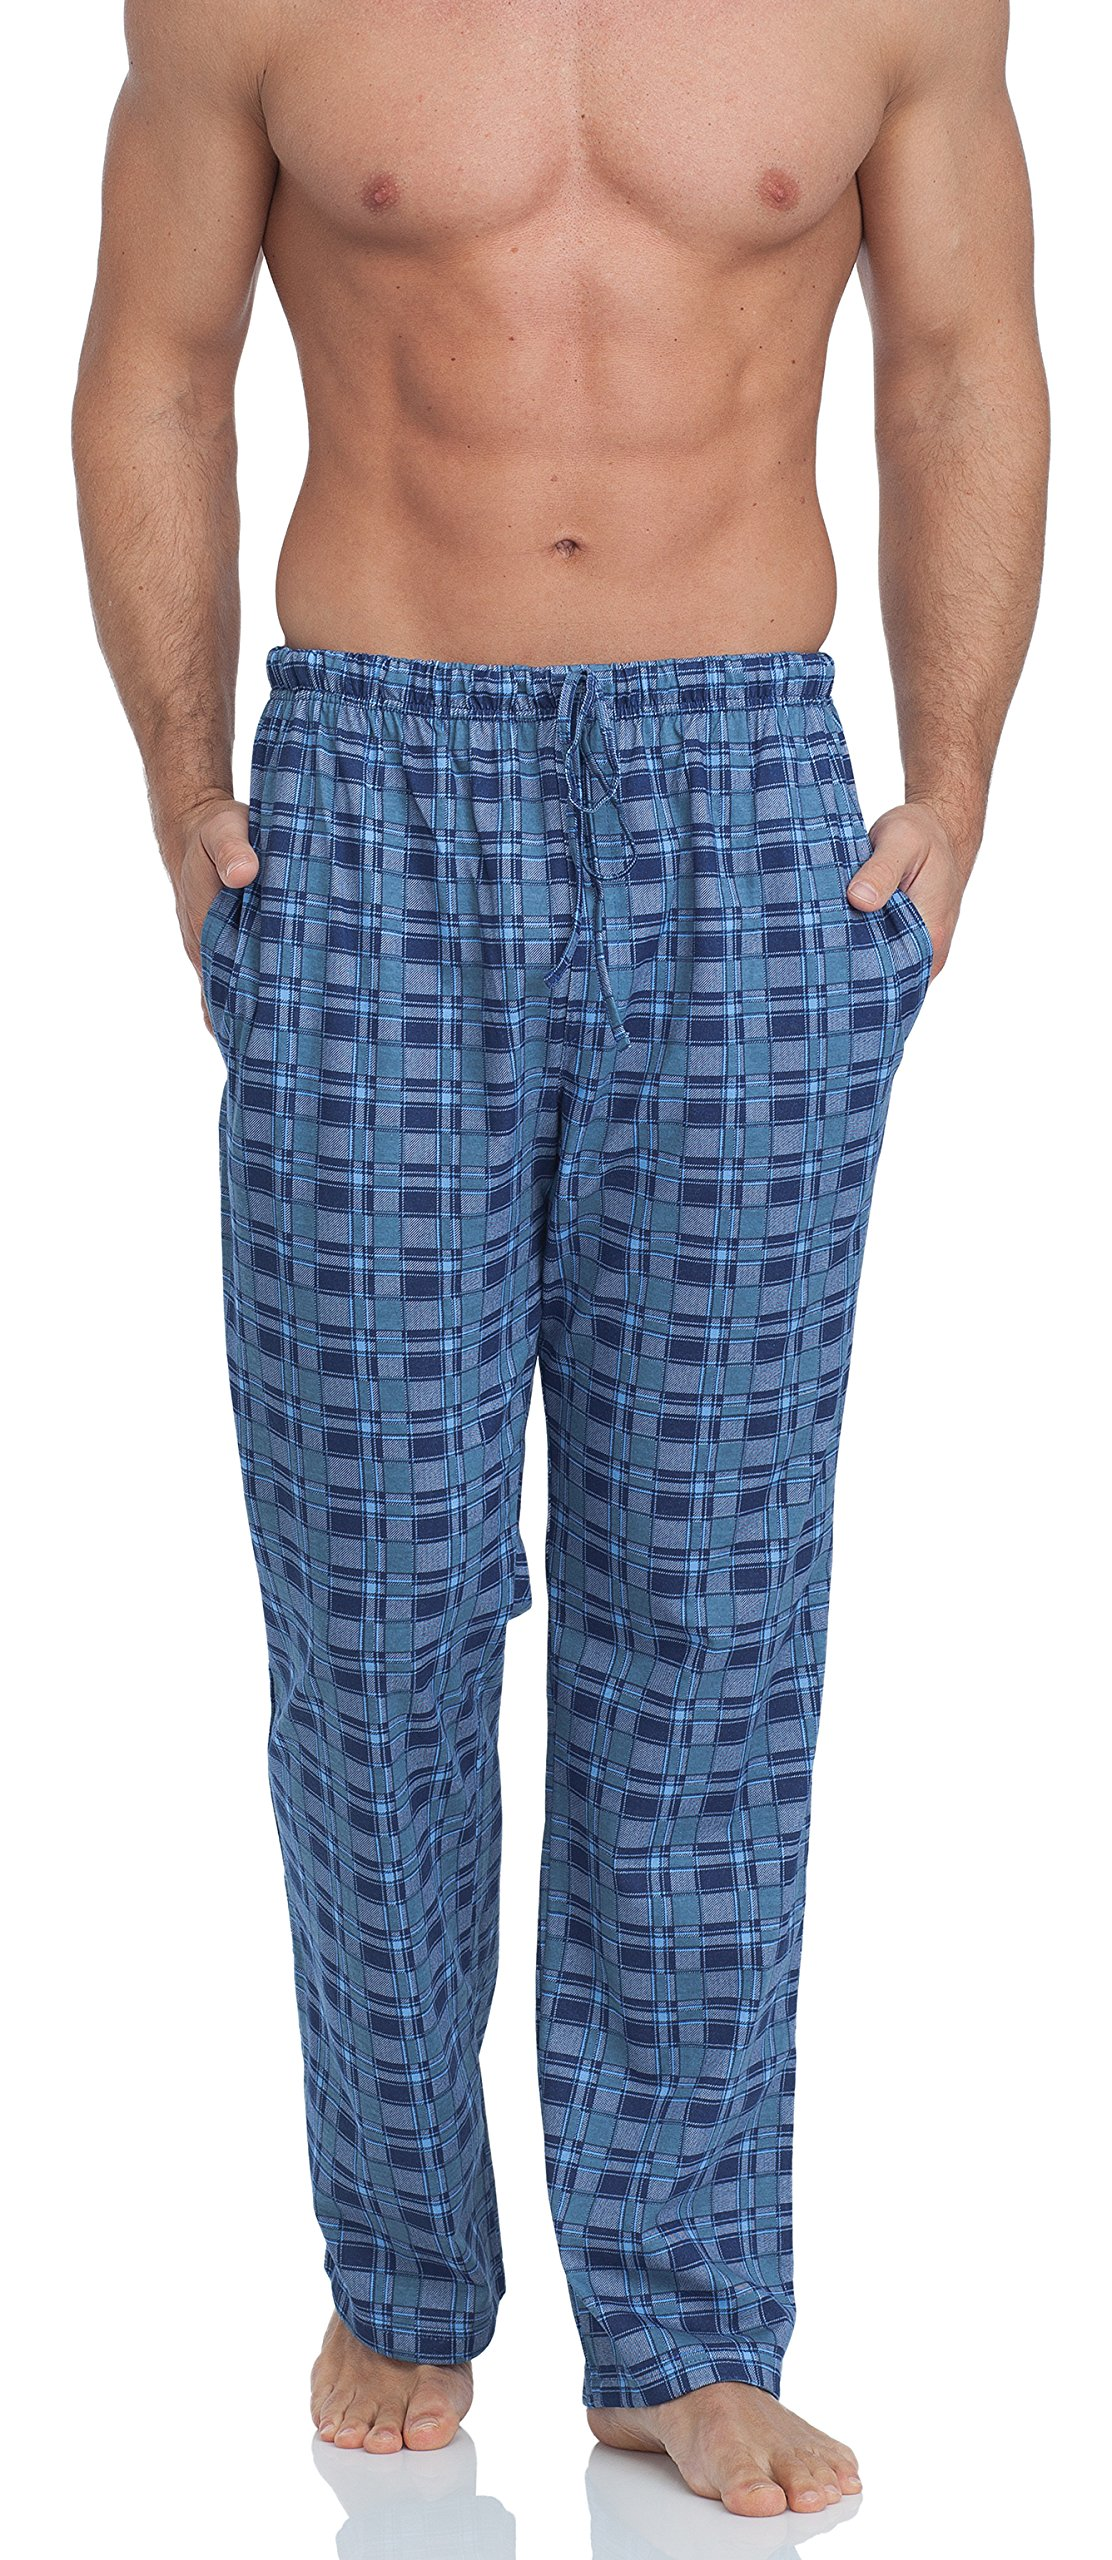 Timone Pantalones Largos de Pijamas 100% Algodón Hombre TPP-001